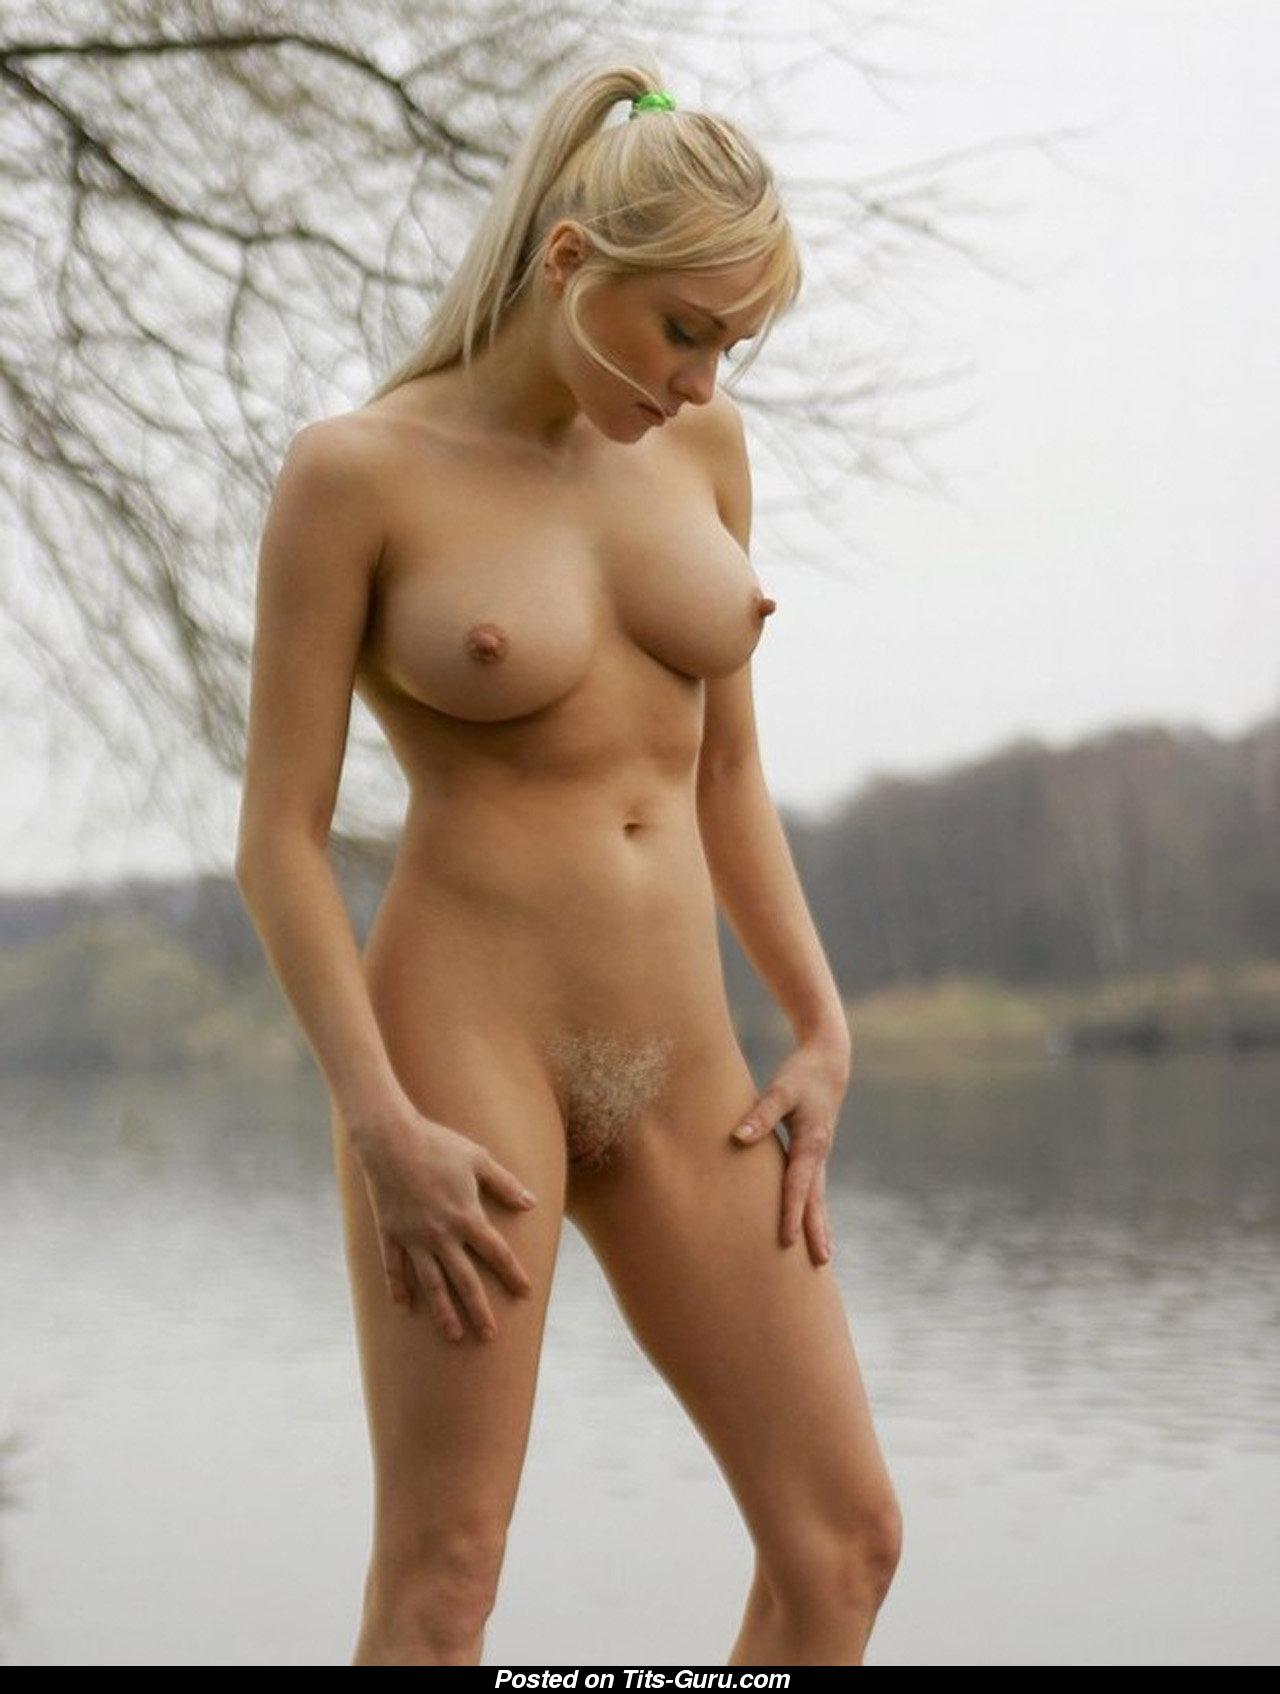 Amateur blonde nude pics